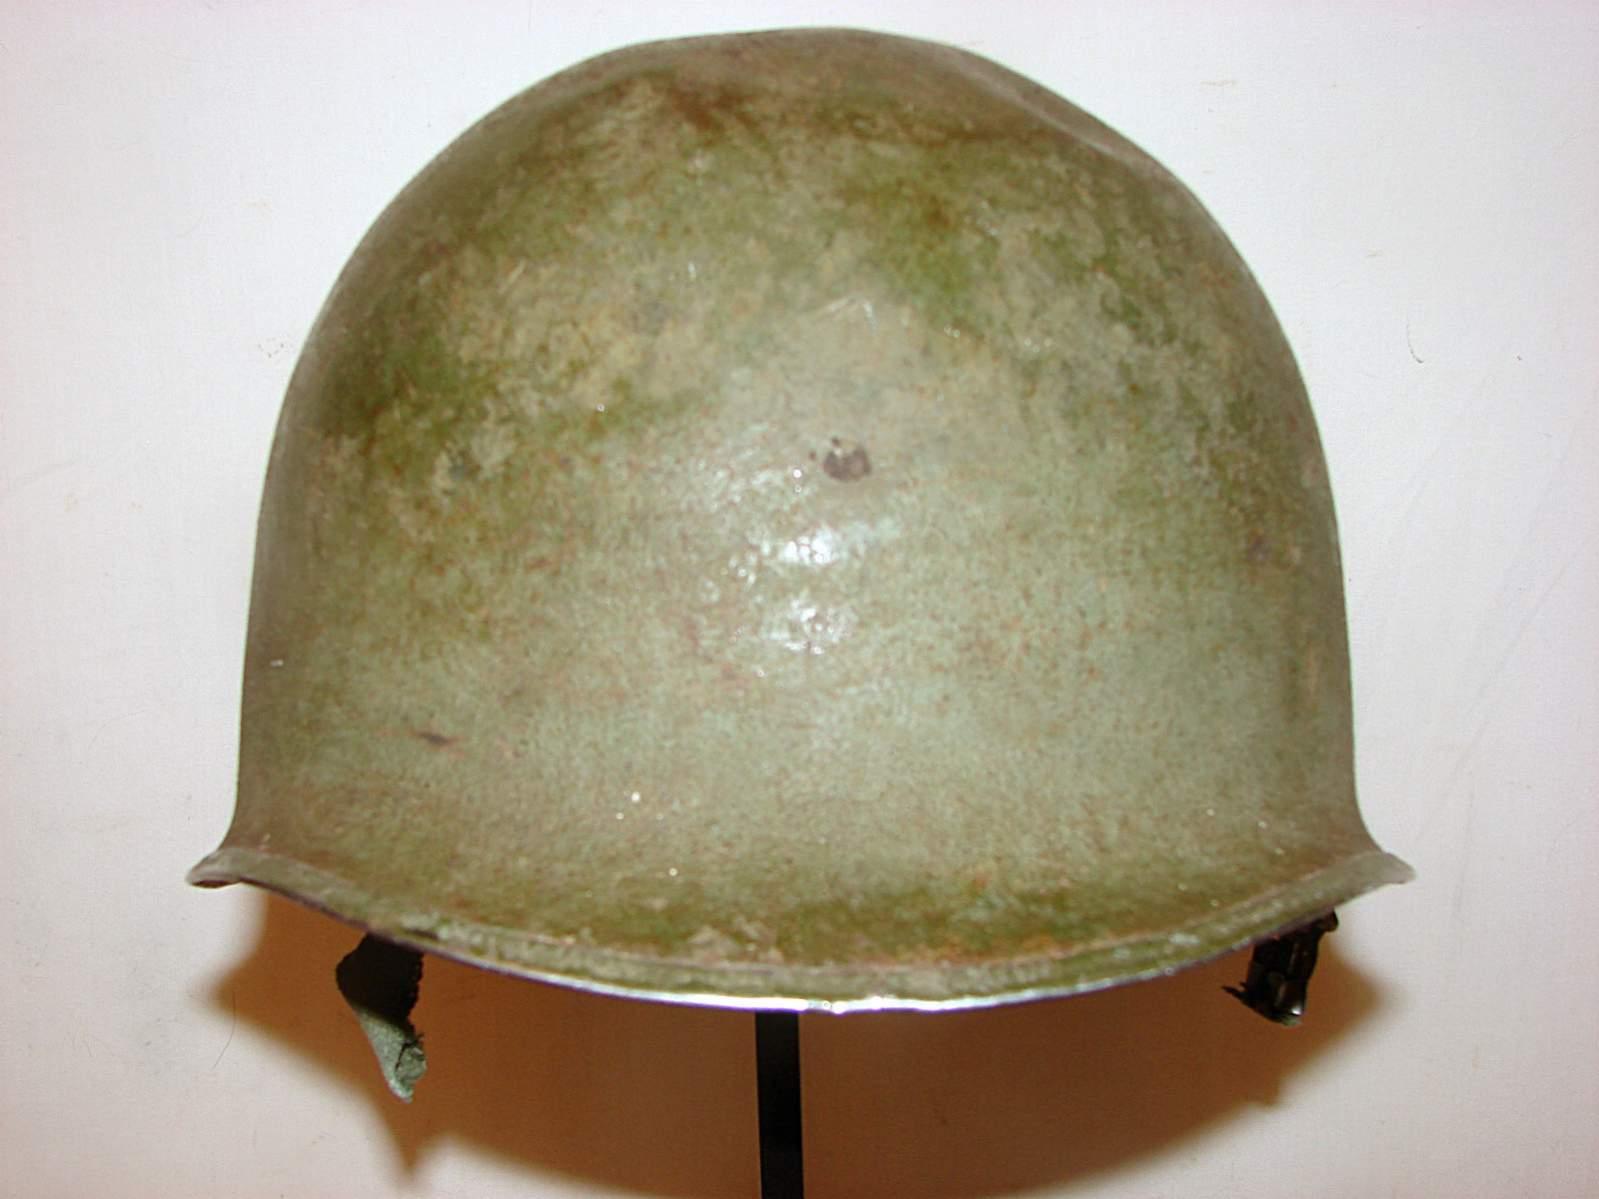 WAR U.S. MARINE CORPS HELMET AND COVER | Militaria | WARSTUFF